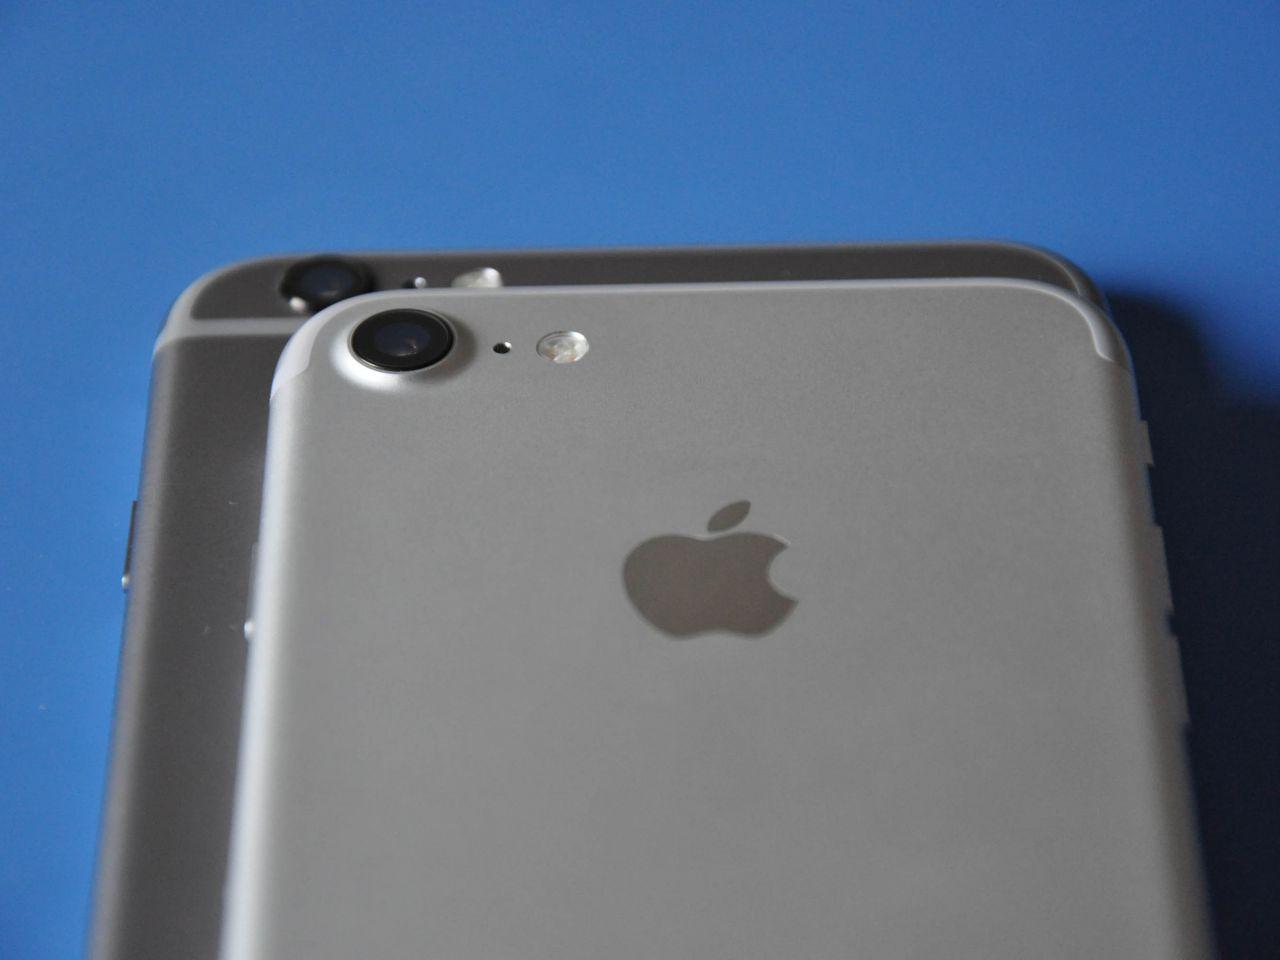 Iphone 7 E Iphone 6s Plus Fotocamere A Confronto